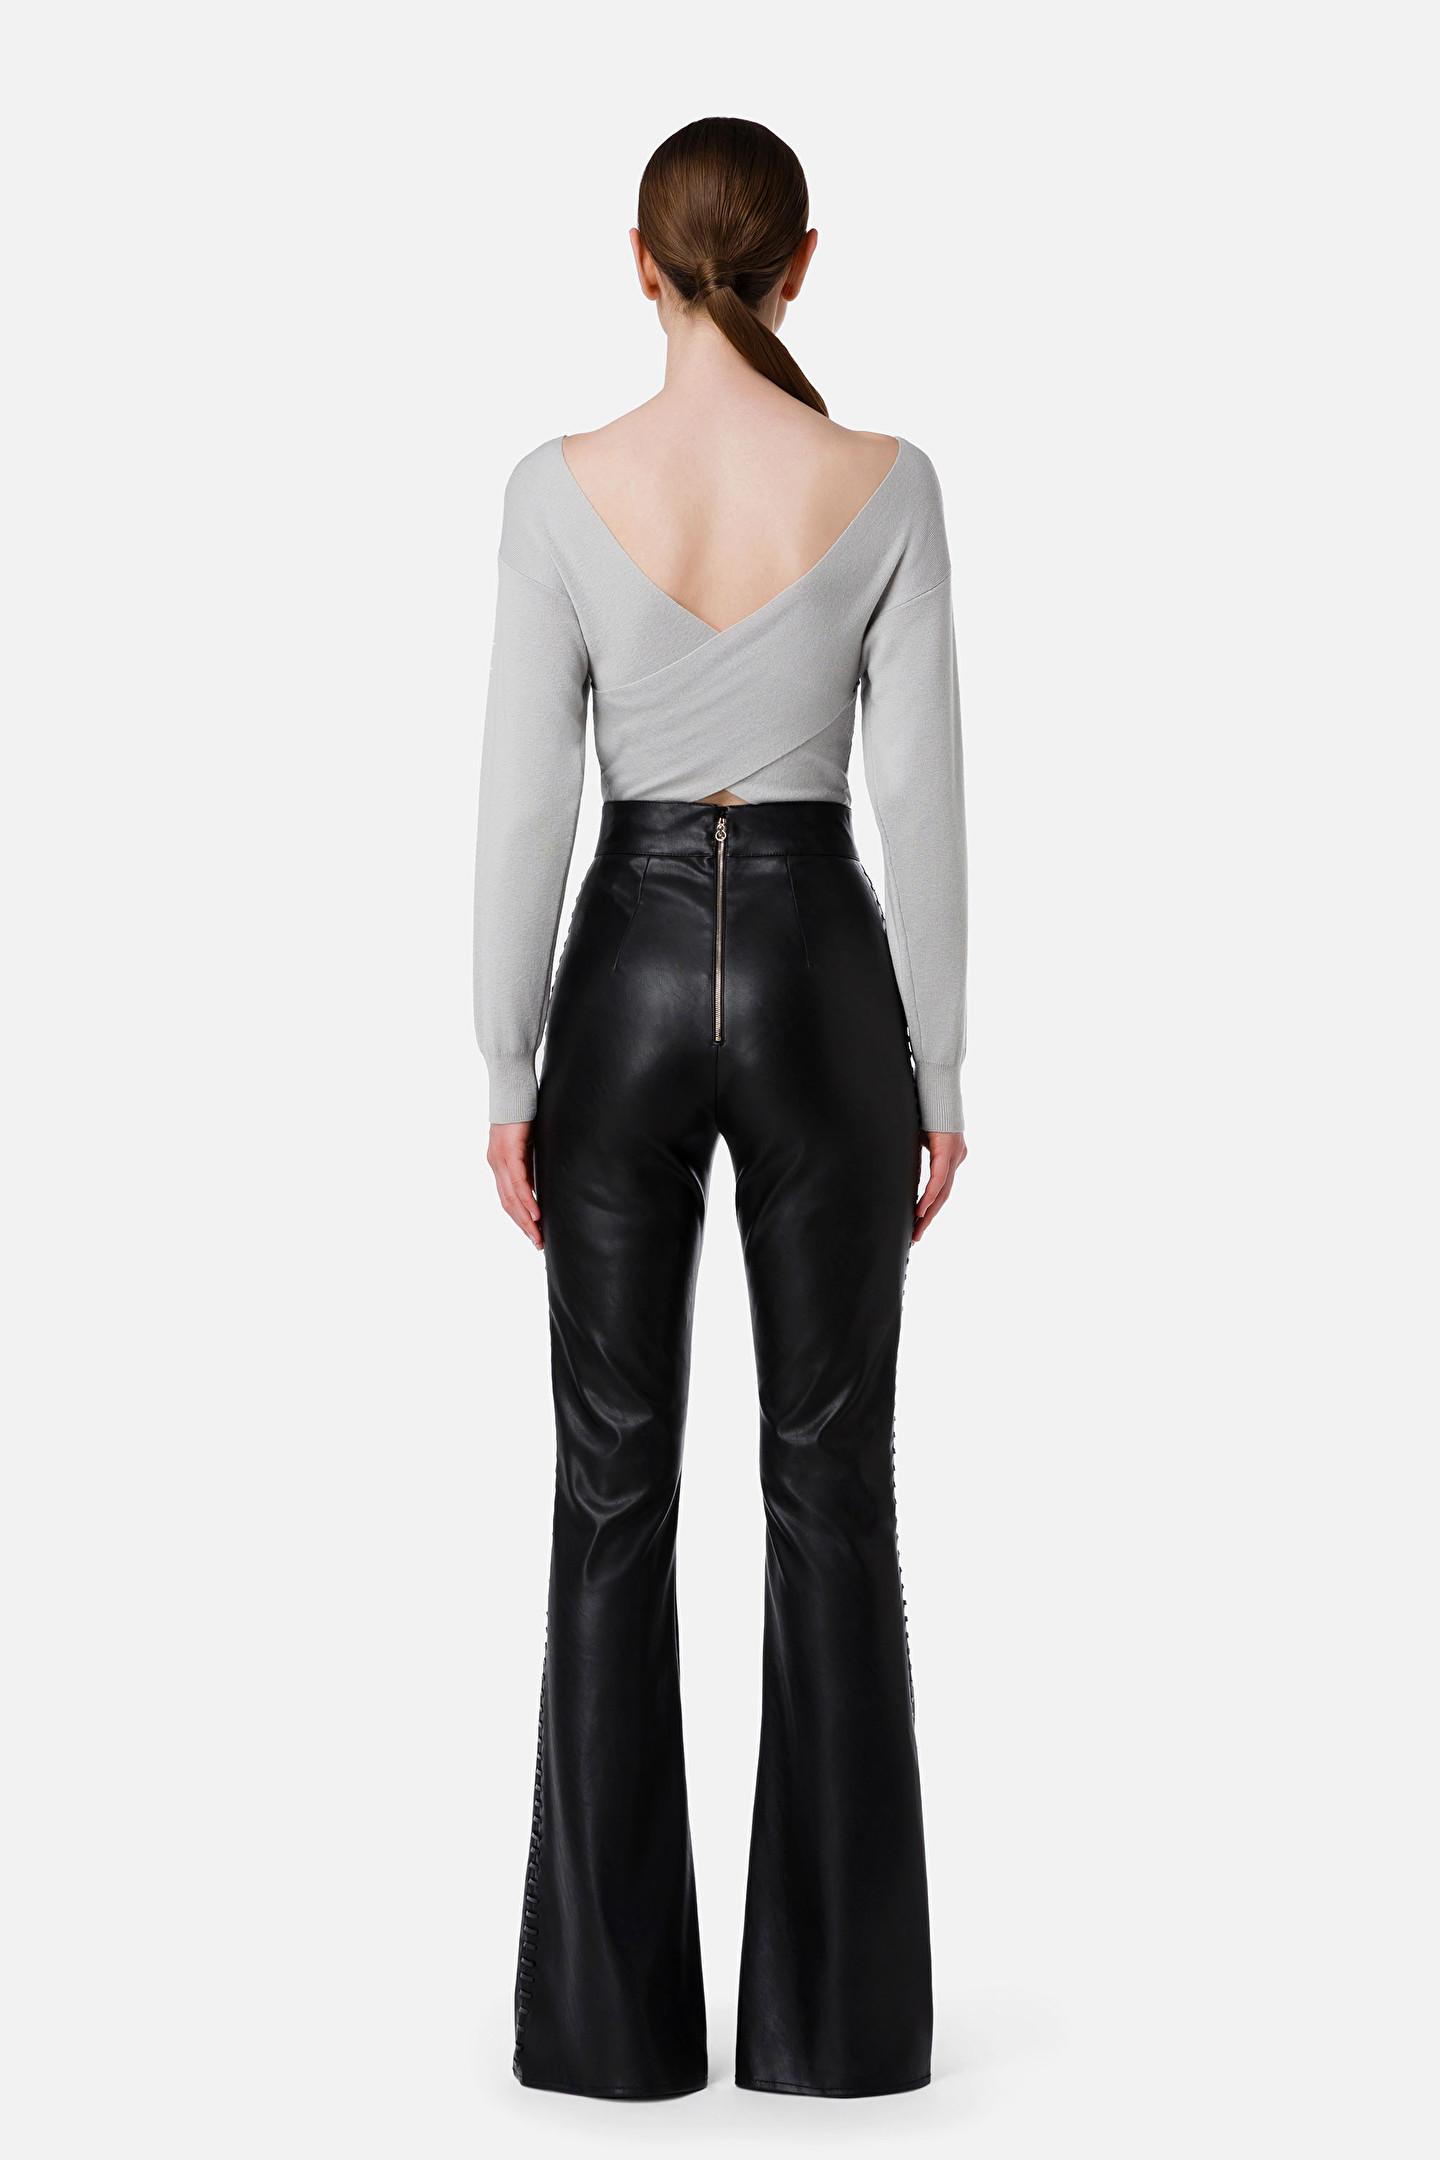 Pantalone donna nero Elisabetta Franchi   PA38016E2110